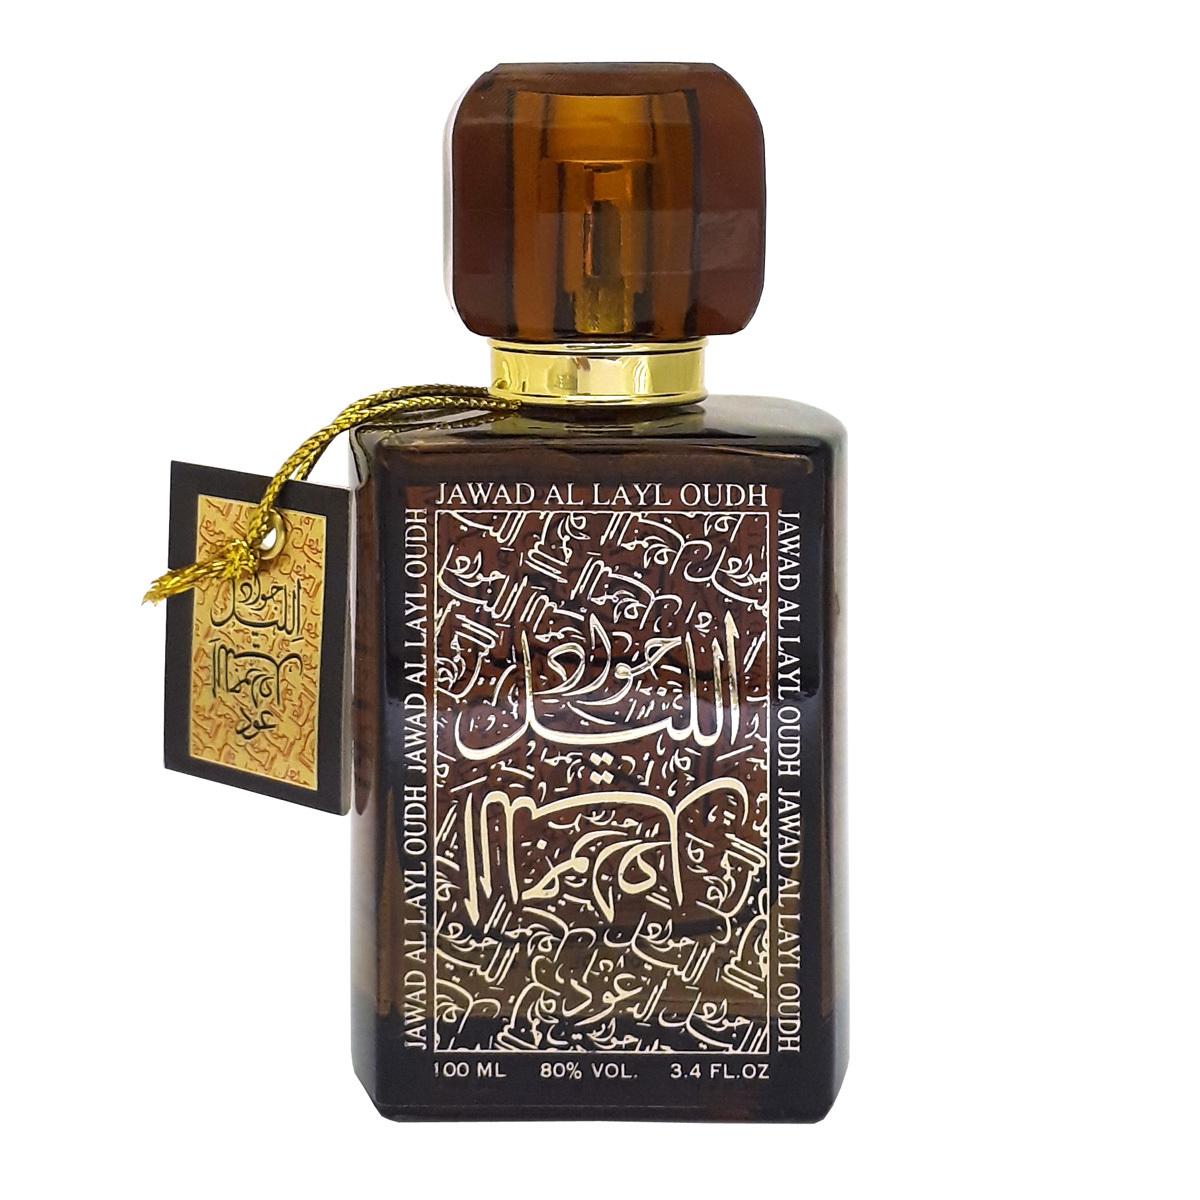 Jawad al Layl Oudh / Джавад Аль Лайл Уд 100 мл спрей от Халис Khalis Perfumes